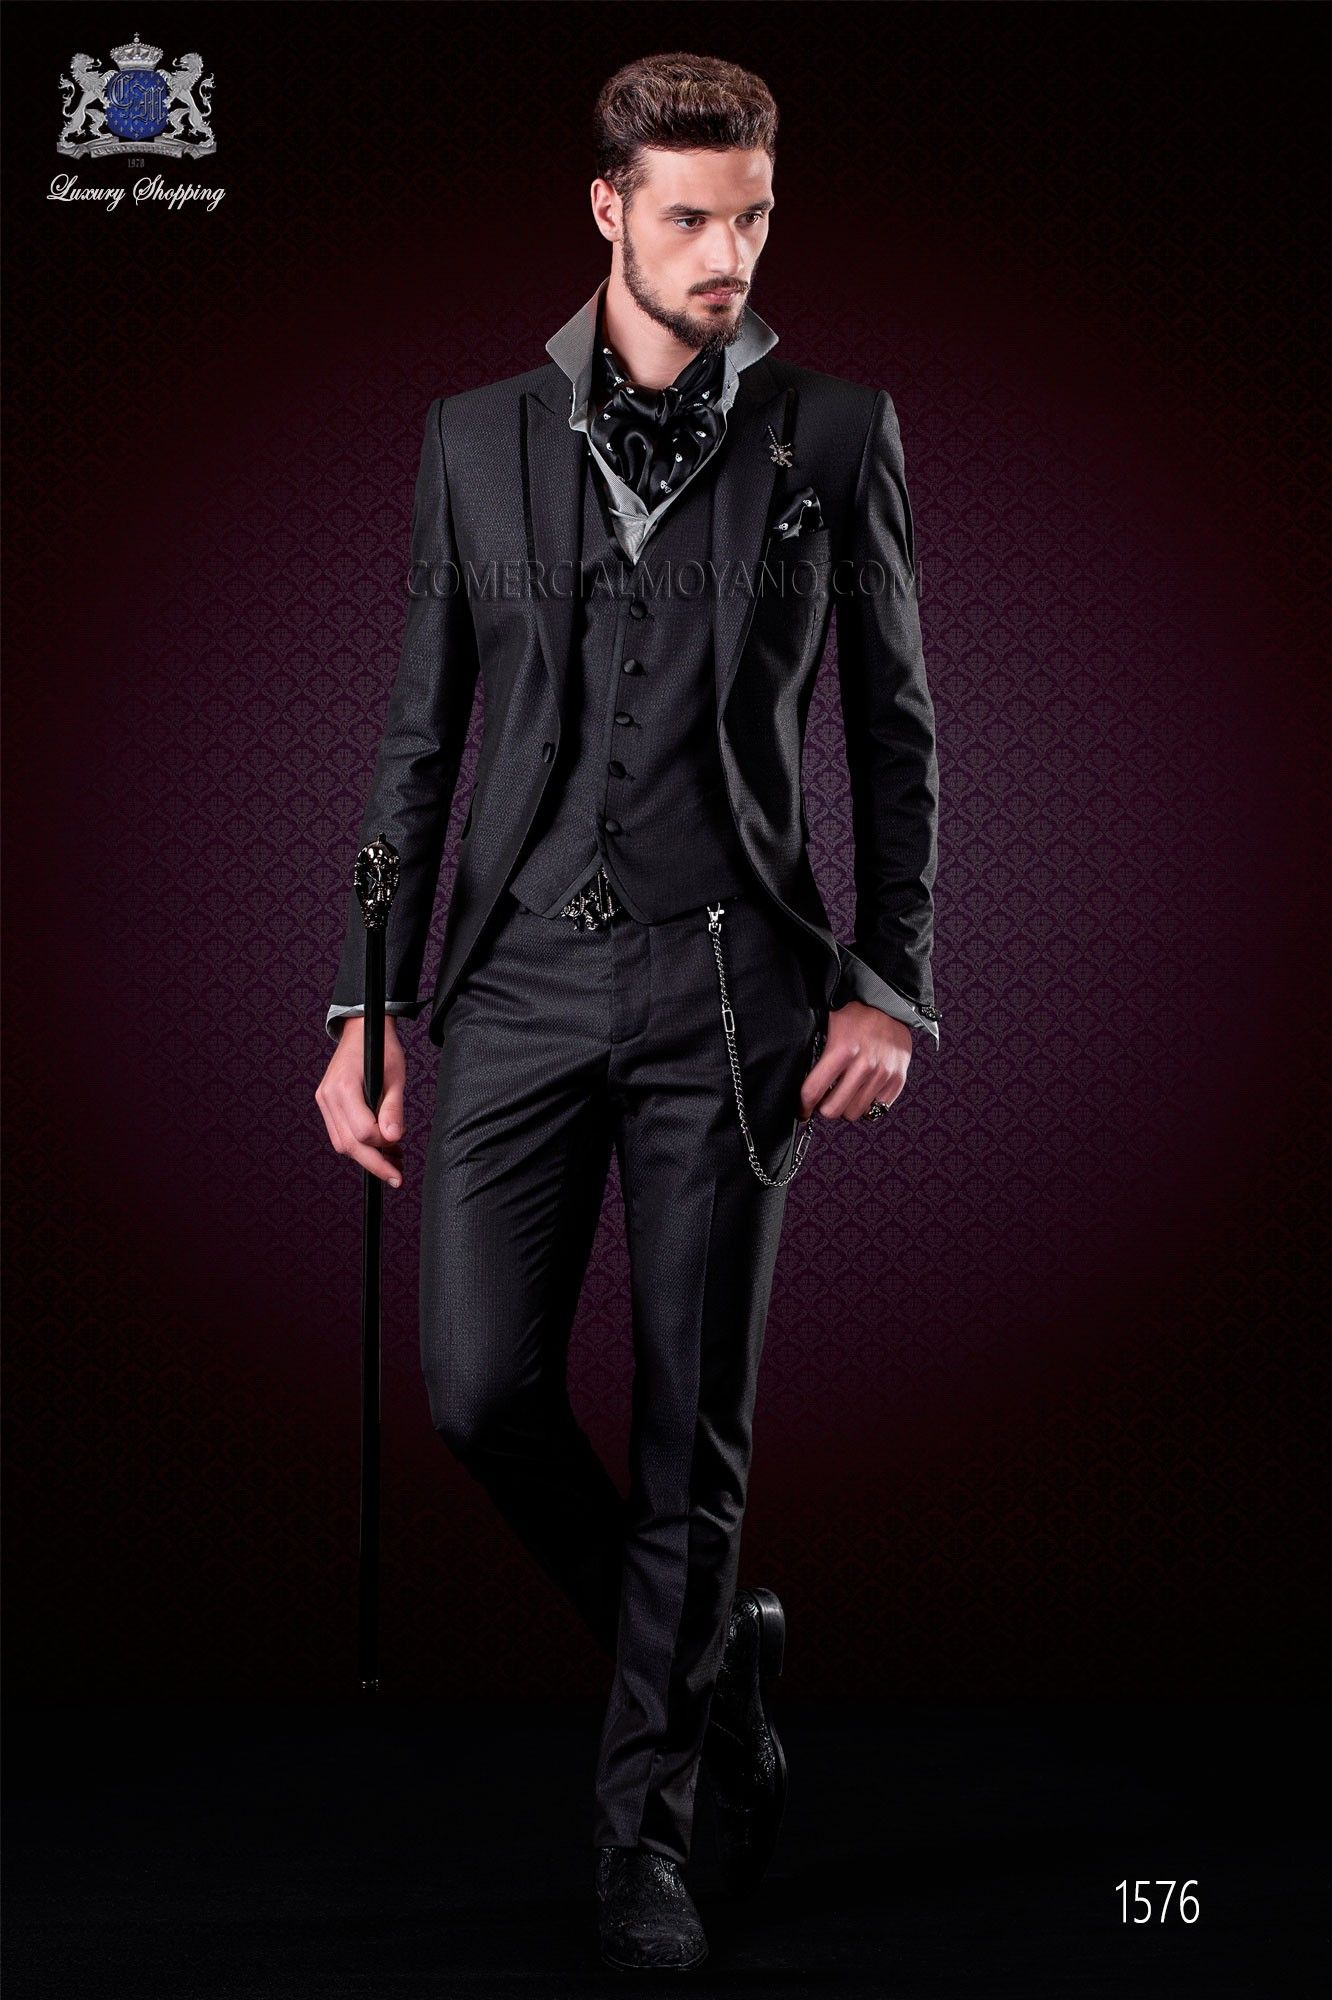 Italienische schwarze mode herren anzug spitzen revers mit satin